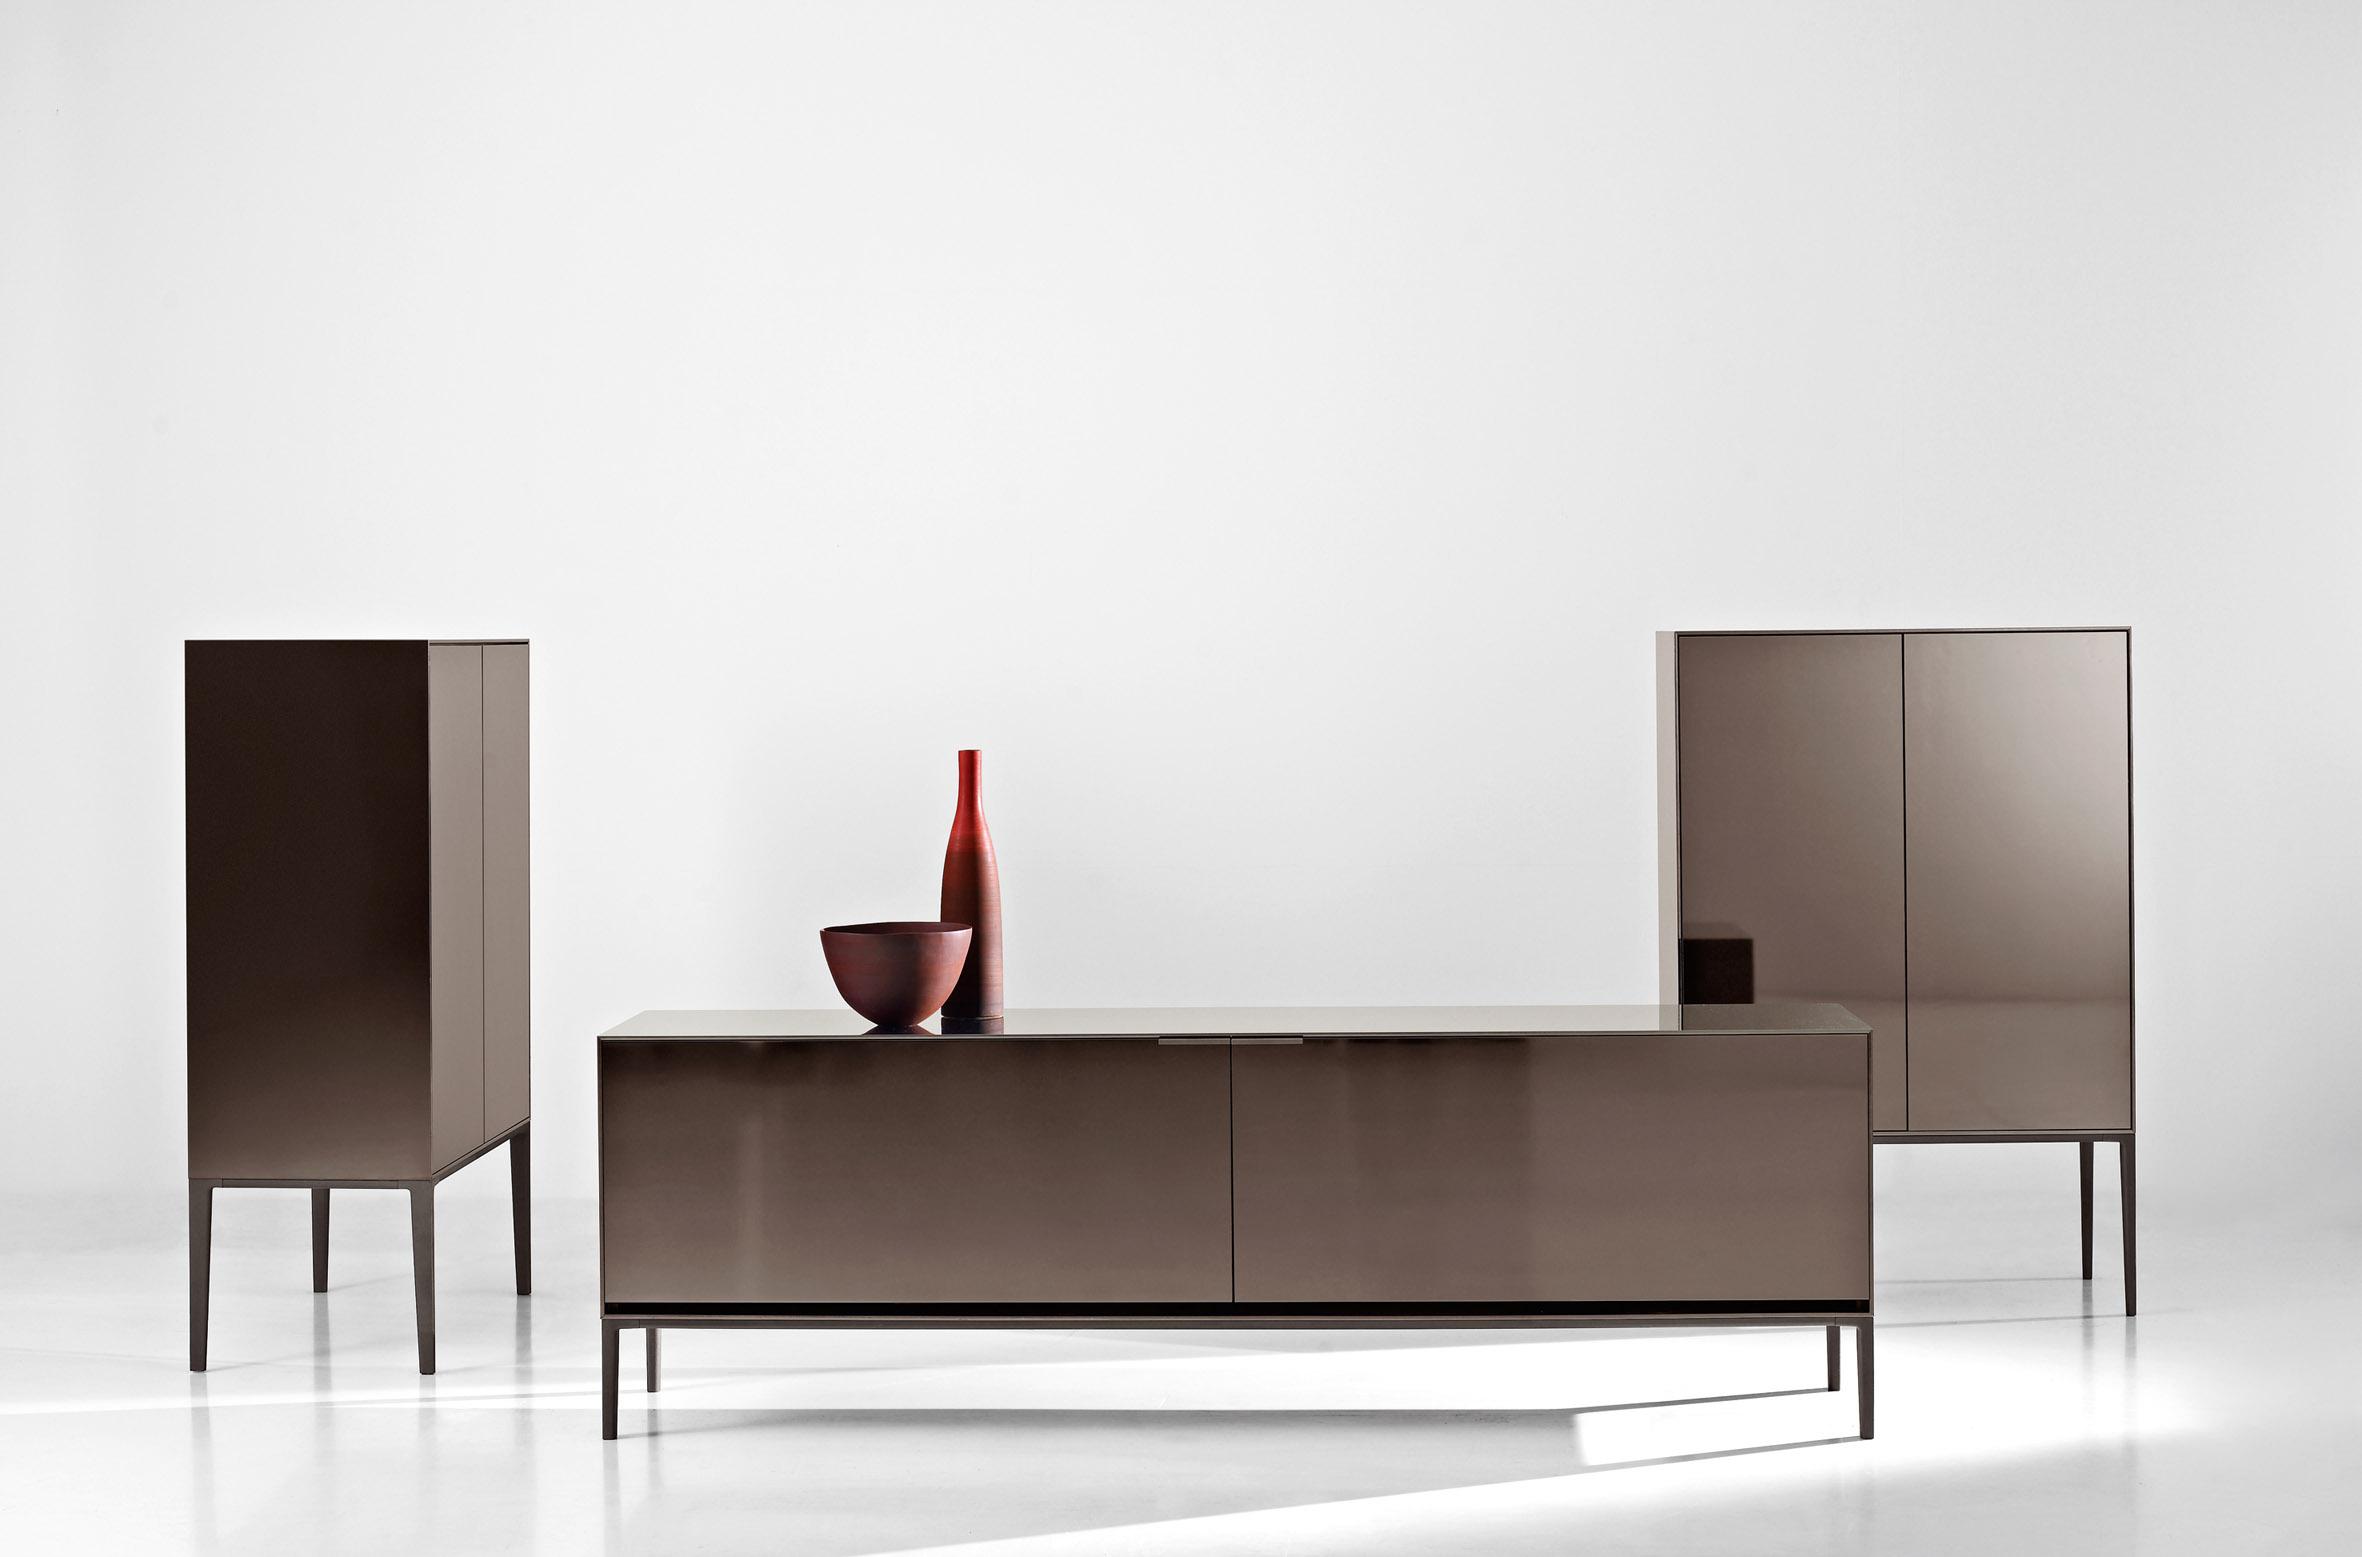 b b italia novedades en imm cologne 2013 escaparate del dise o. Black Bedroom Furniture Sets. Home Design Ideas